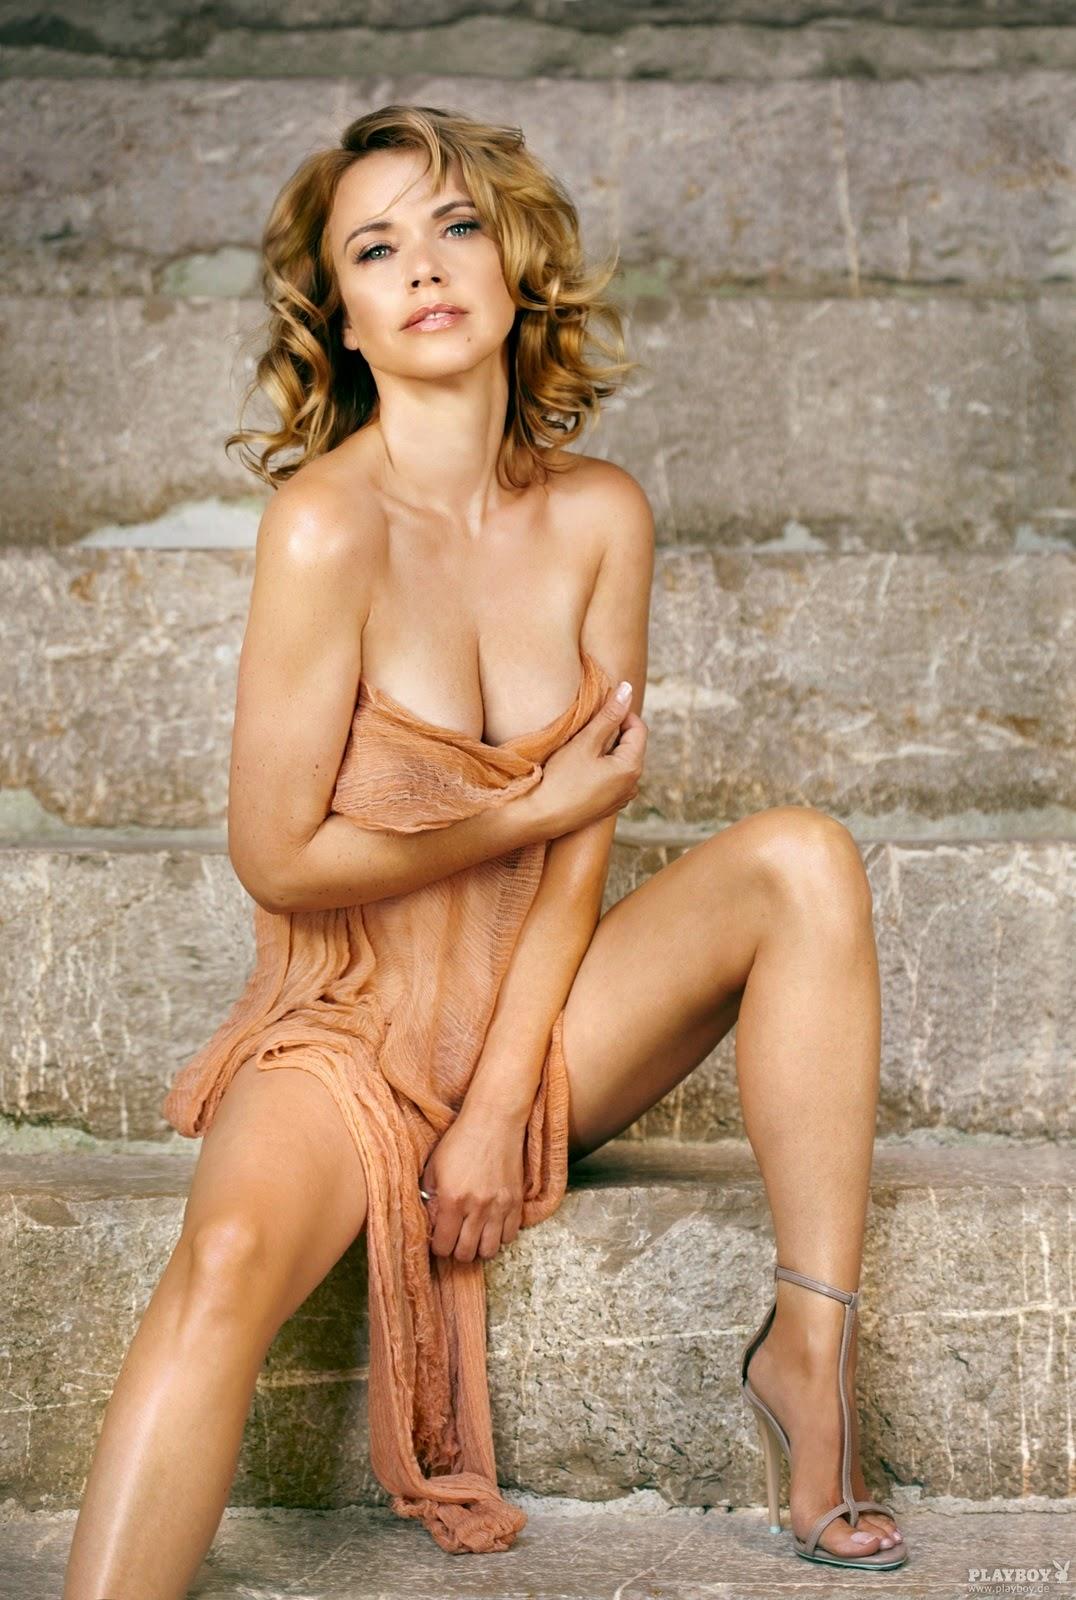 image Henriette mueller nude berlin calling